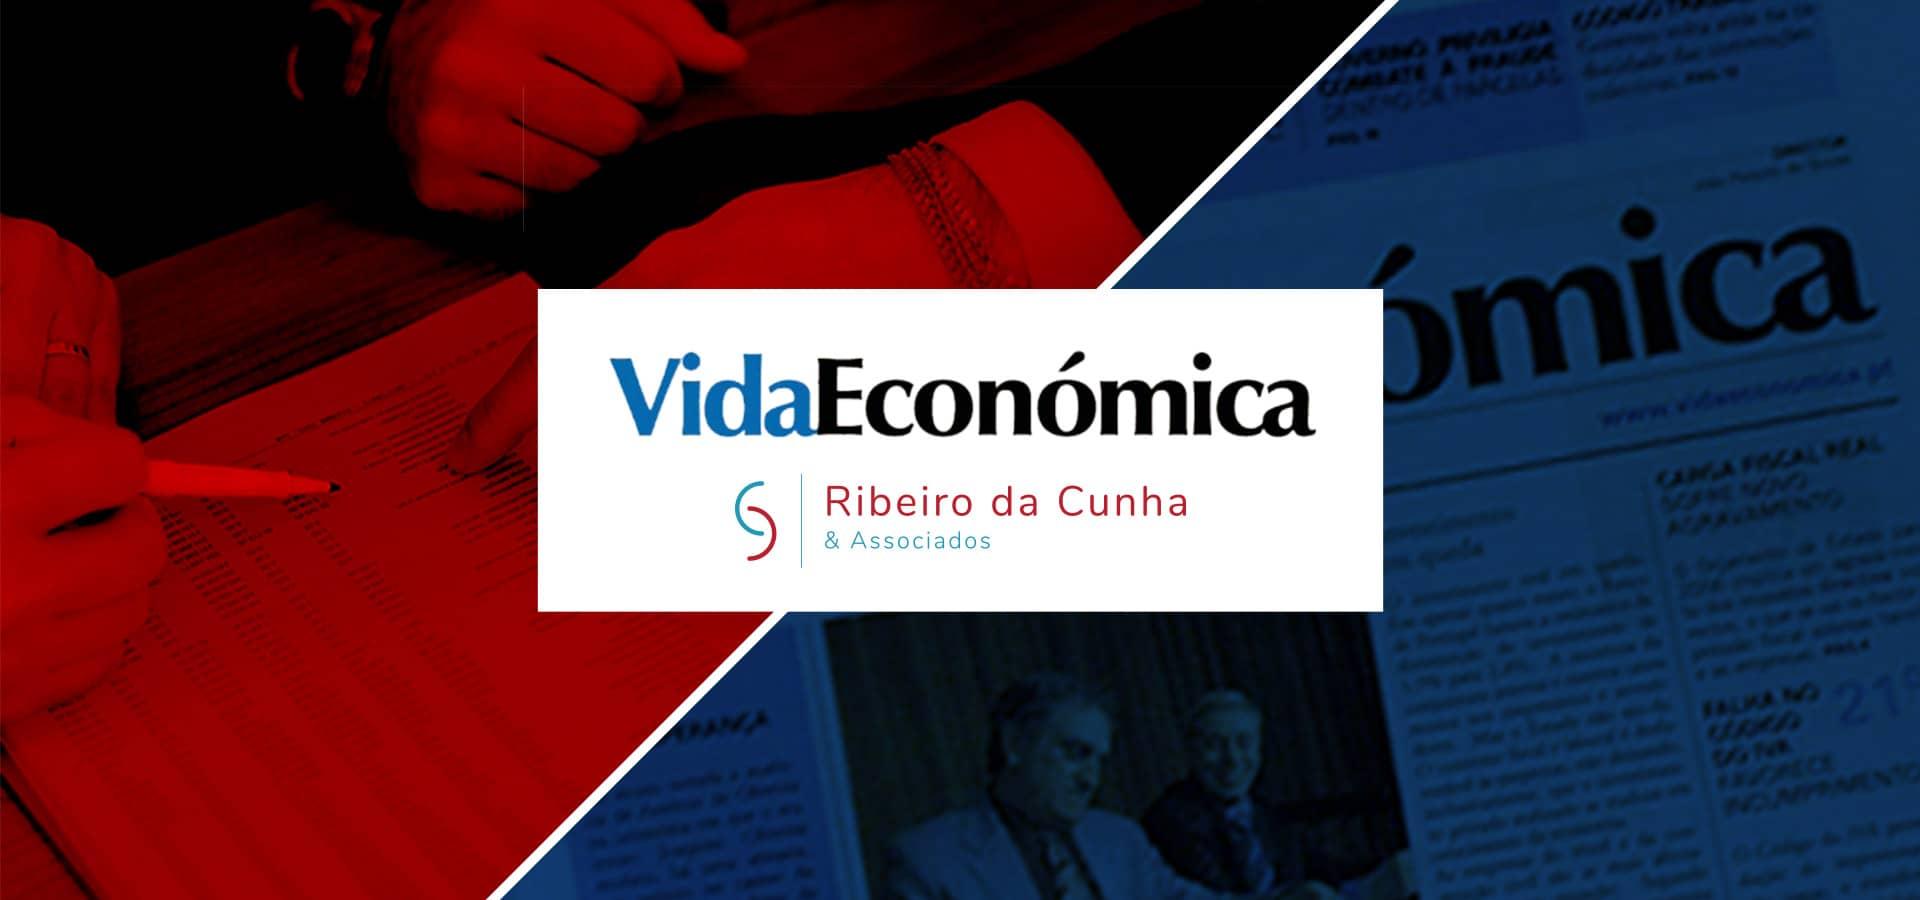 sroc - sociedade de revisores e auditores ribeiro da cunha associados - artigo: parceria vida económica